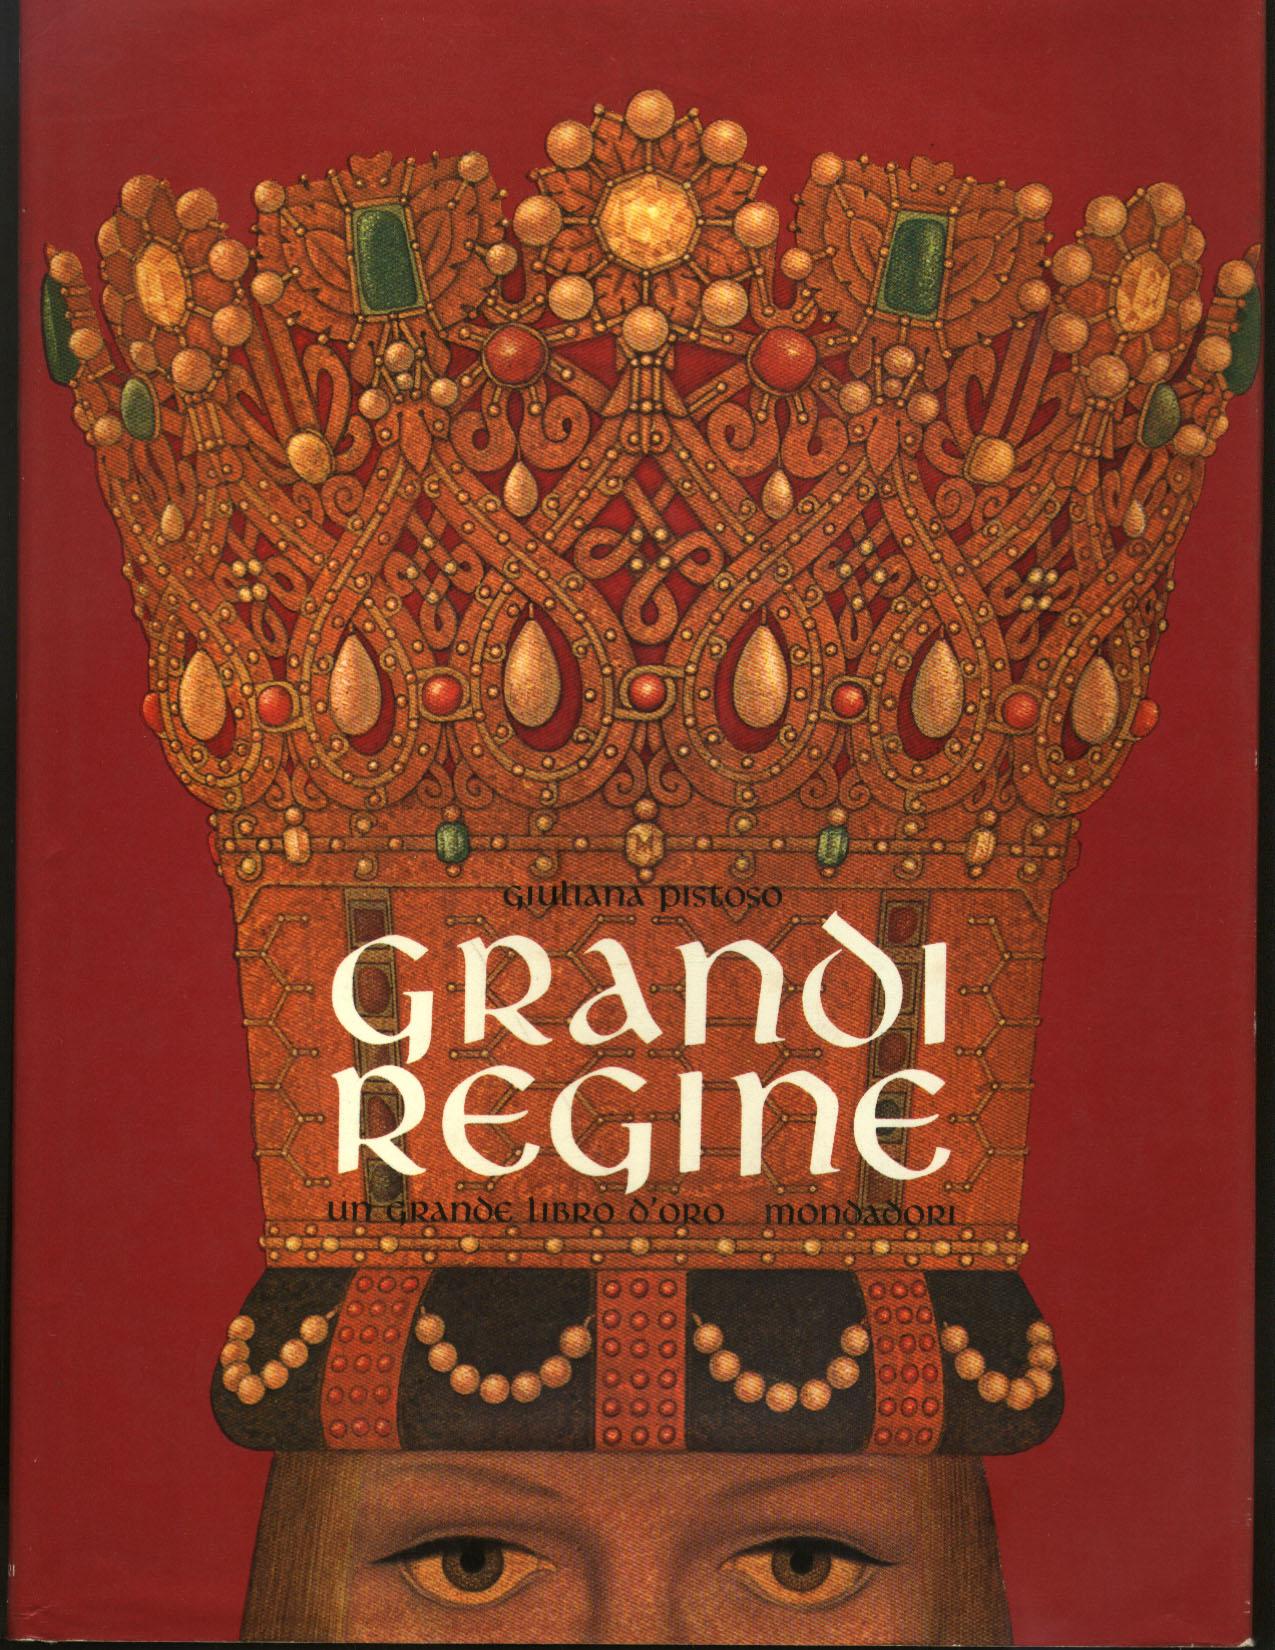 Grandi Regine